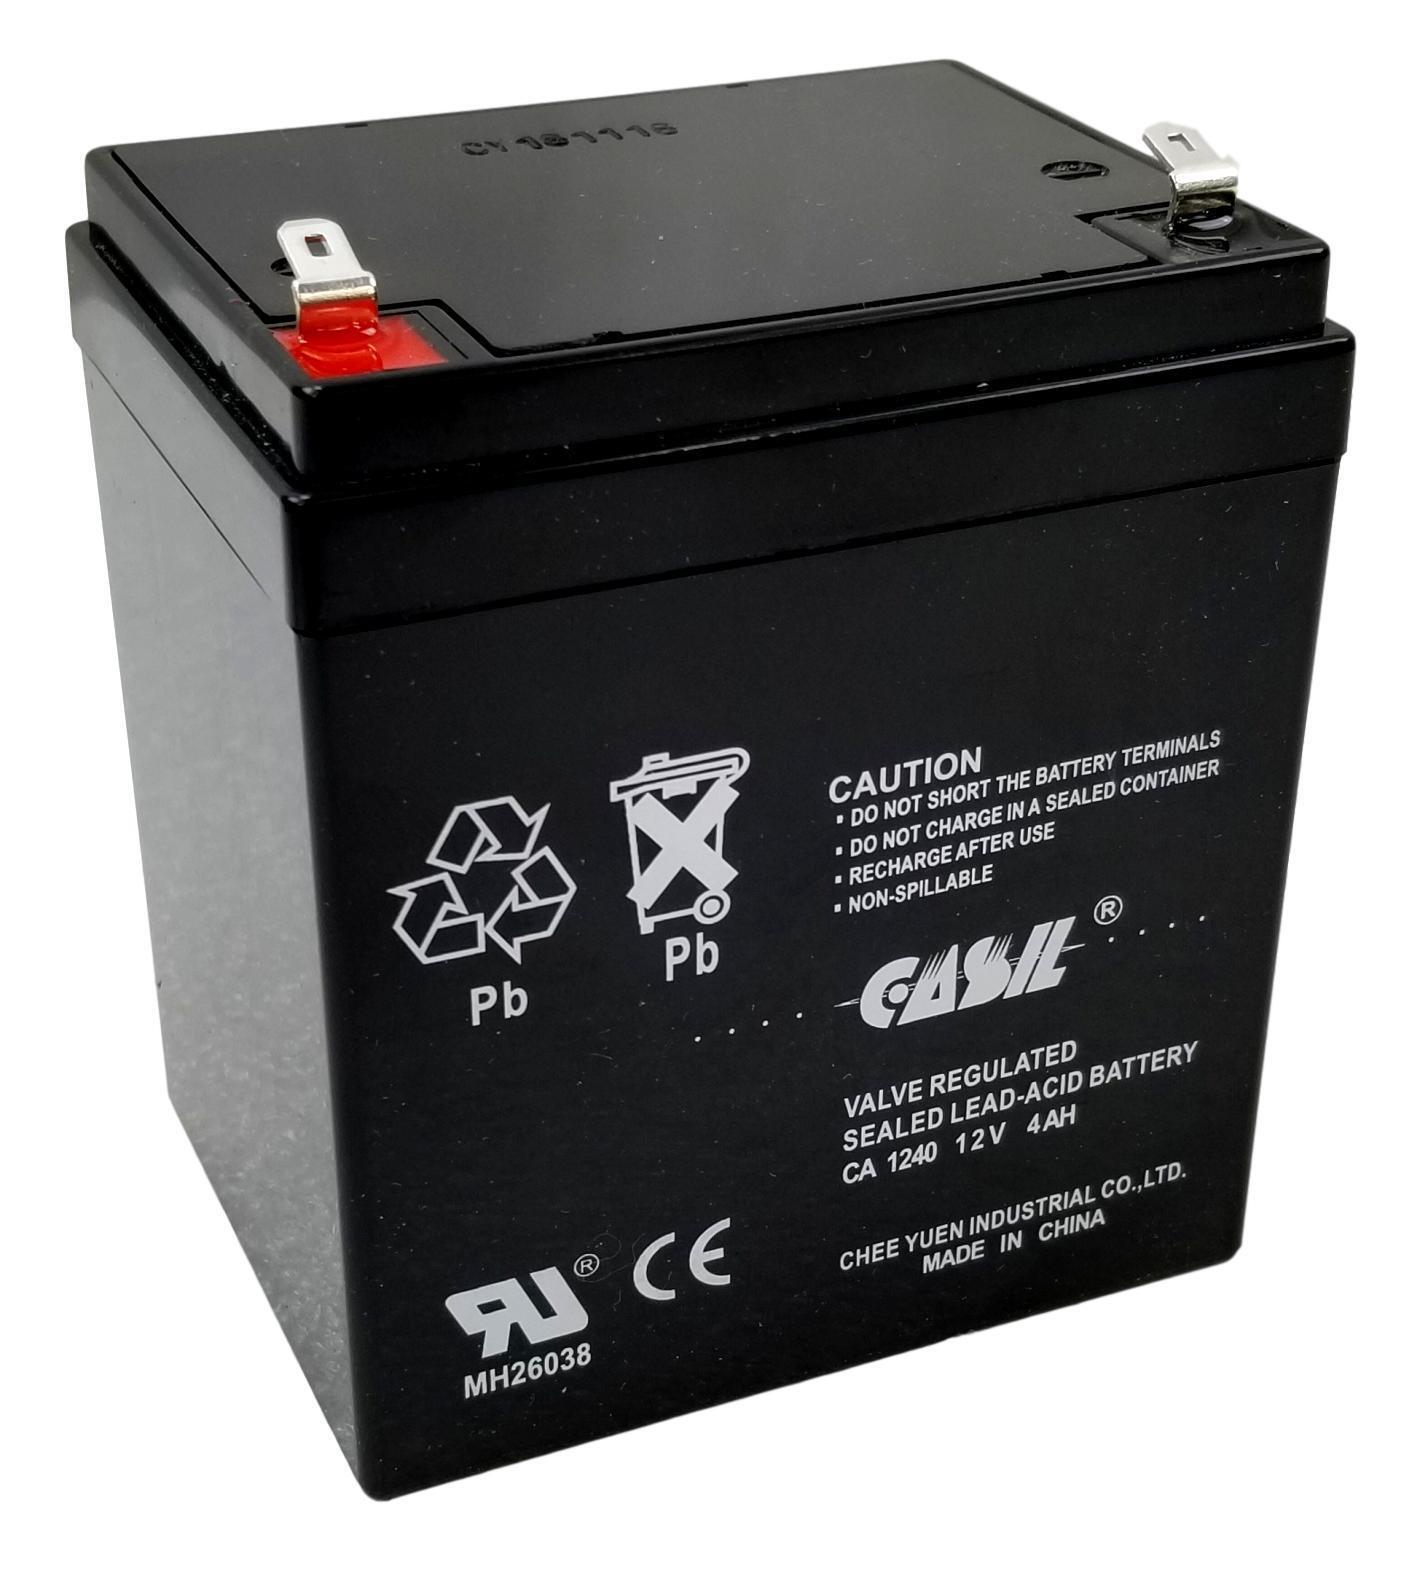 CASIL CA-1240 12V 4AH SLA Battery for Casil Ca1240 Alarm Con